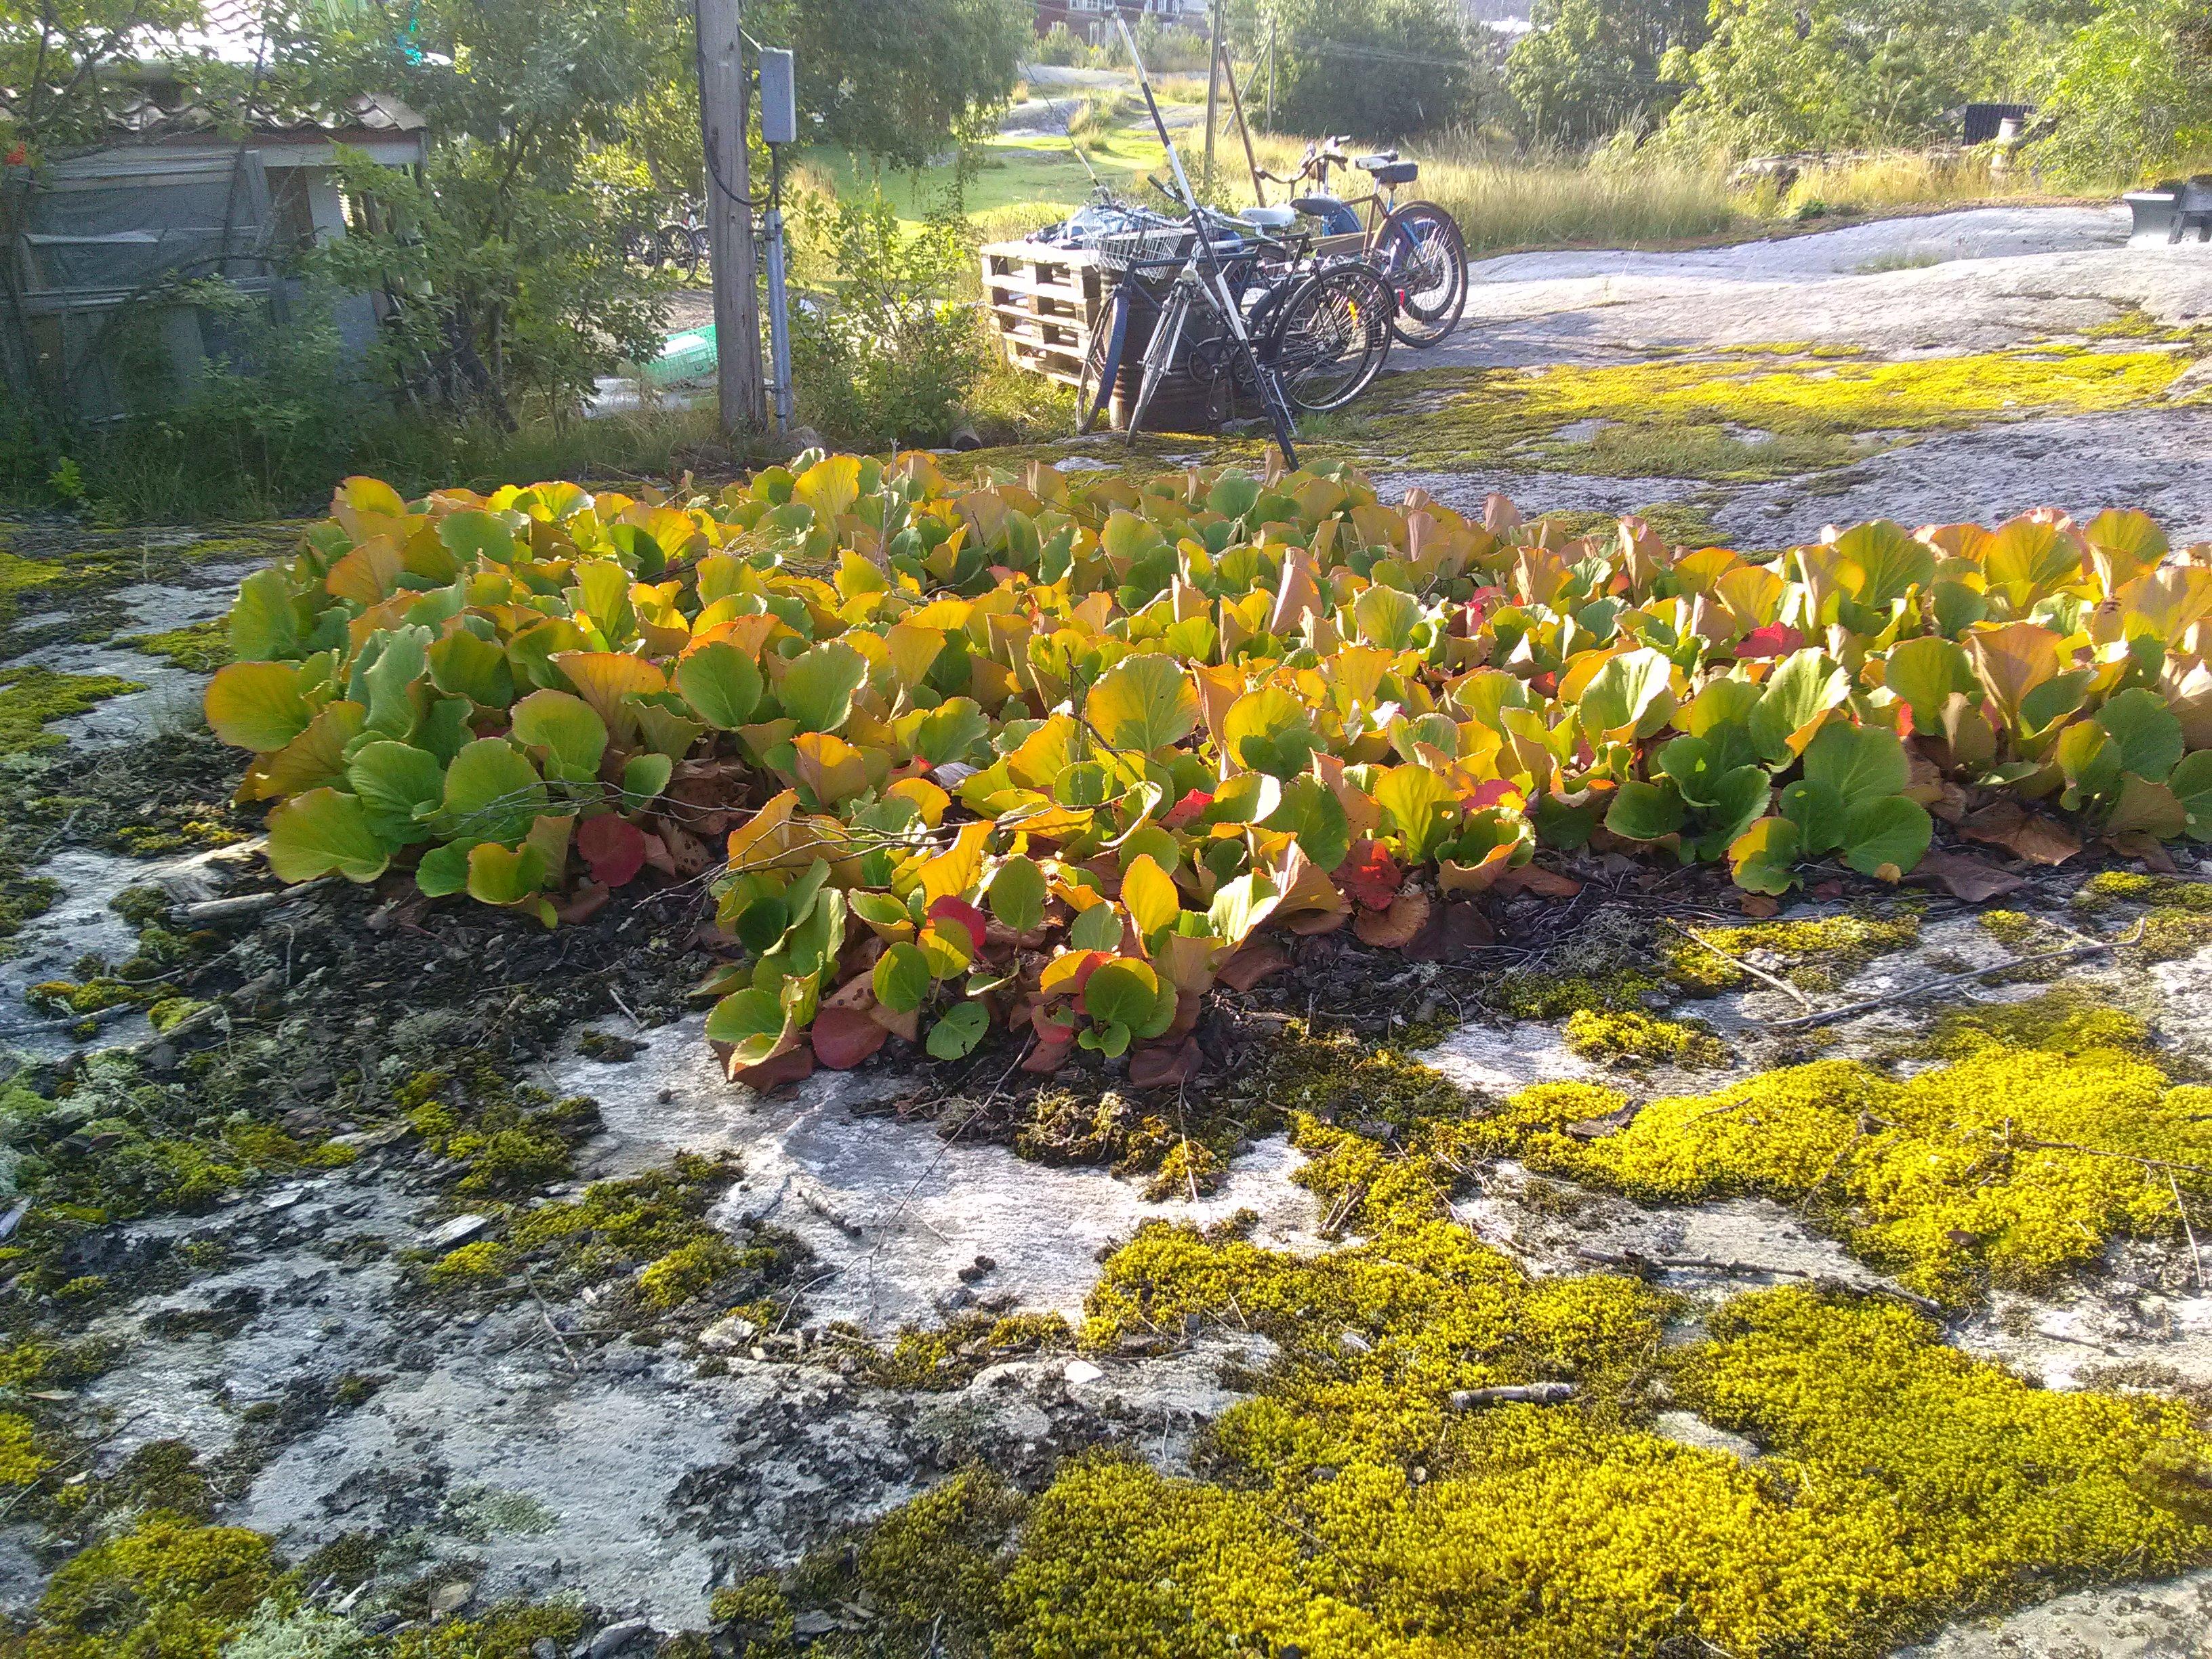 rotsbeplanting